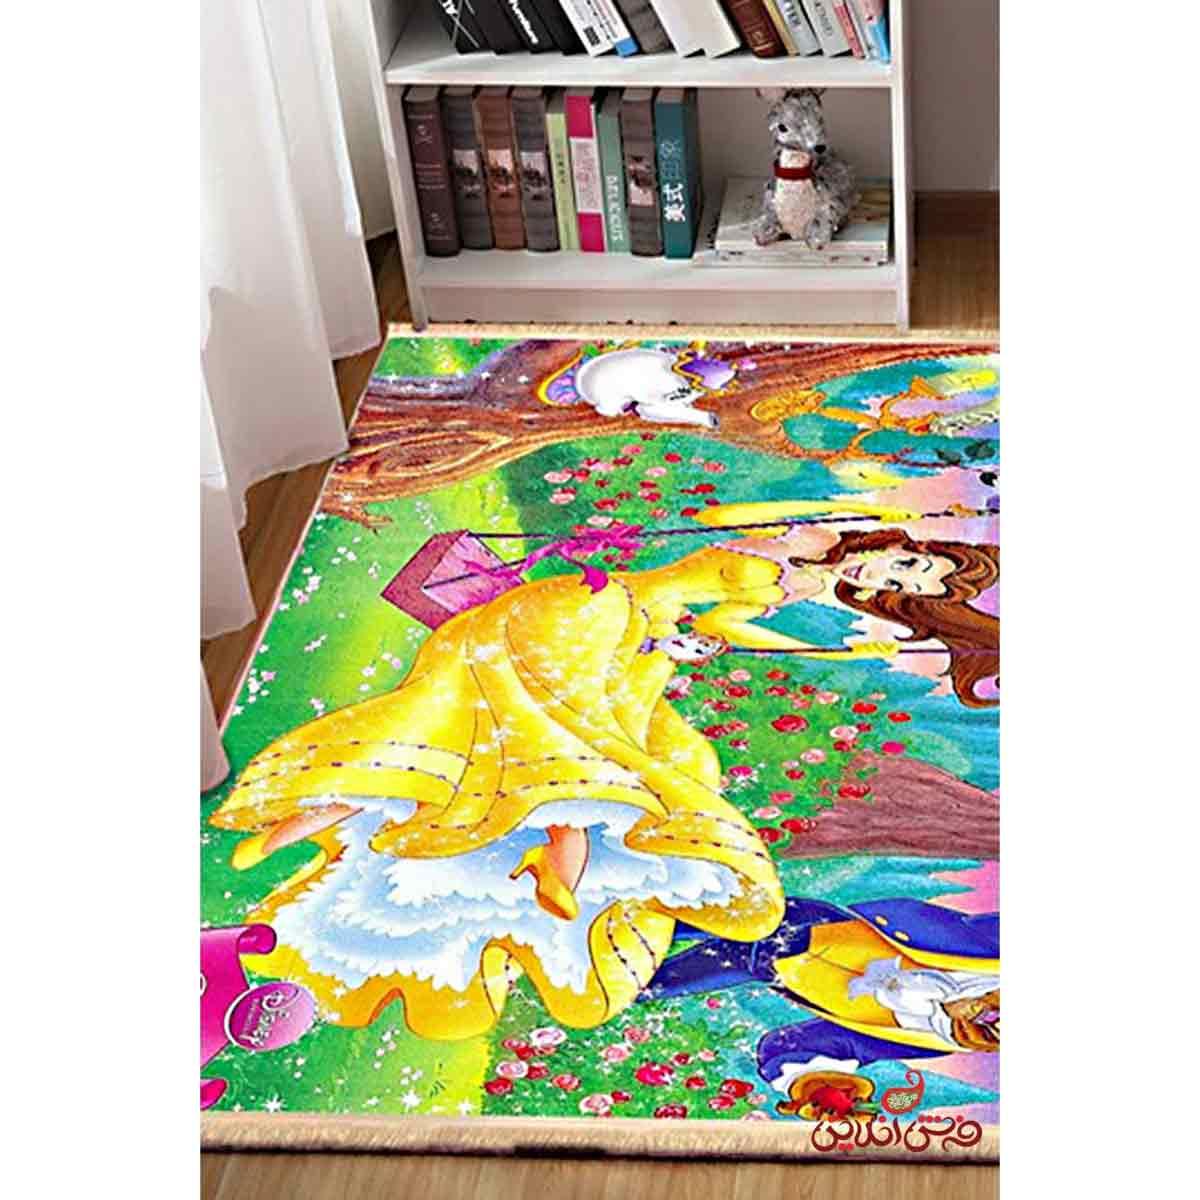 فرش ماشینی کودک کلاریس طرح دیو و دلبر کد 100223